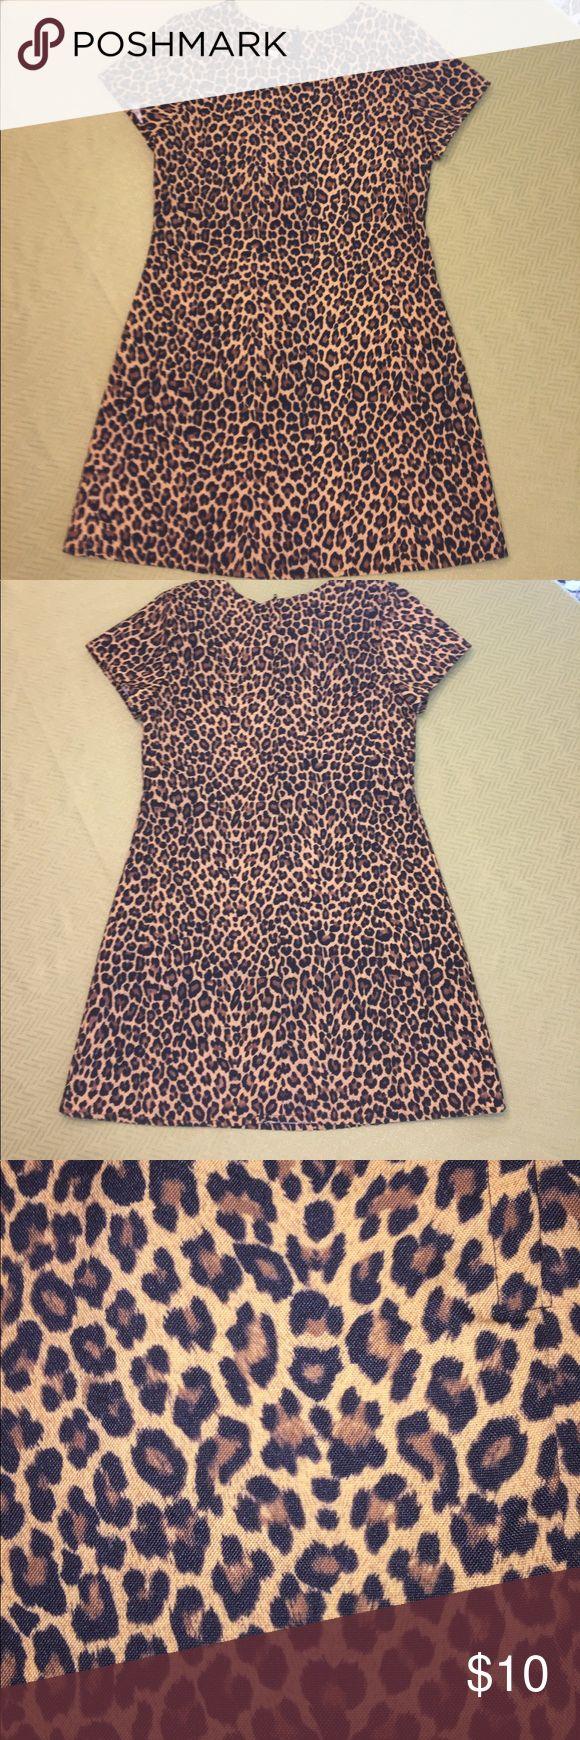 Animal print dress. Vintage animal print dress. Size 12 juniors. Amy Byer Dresses